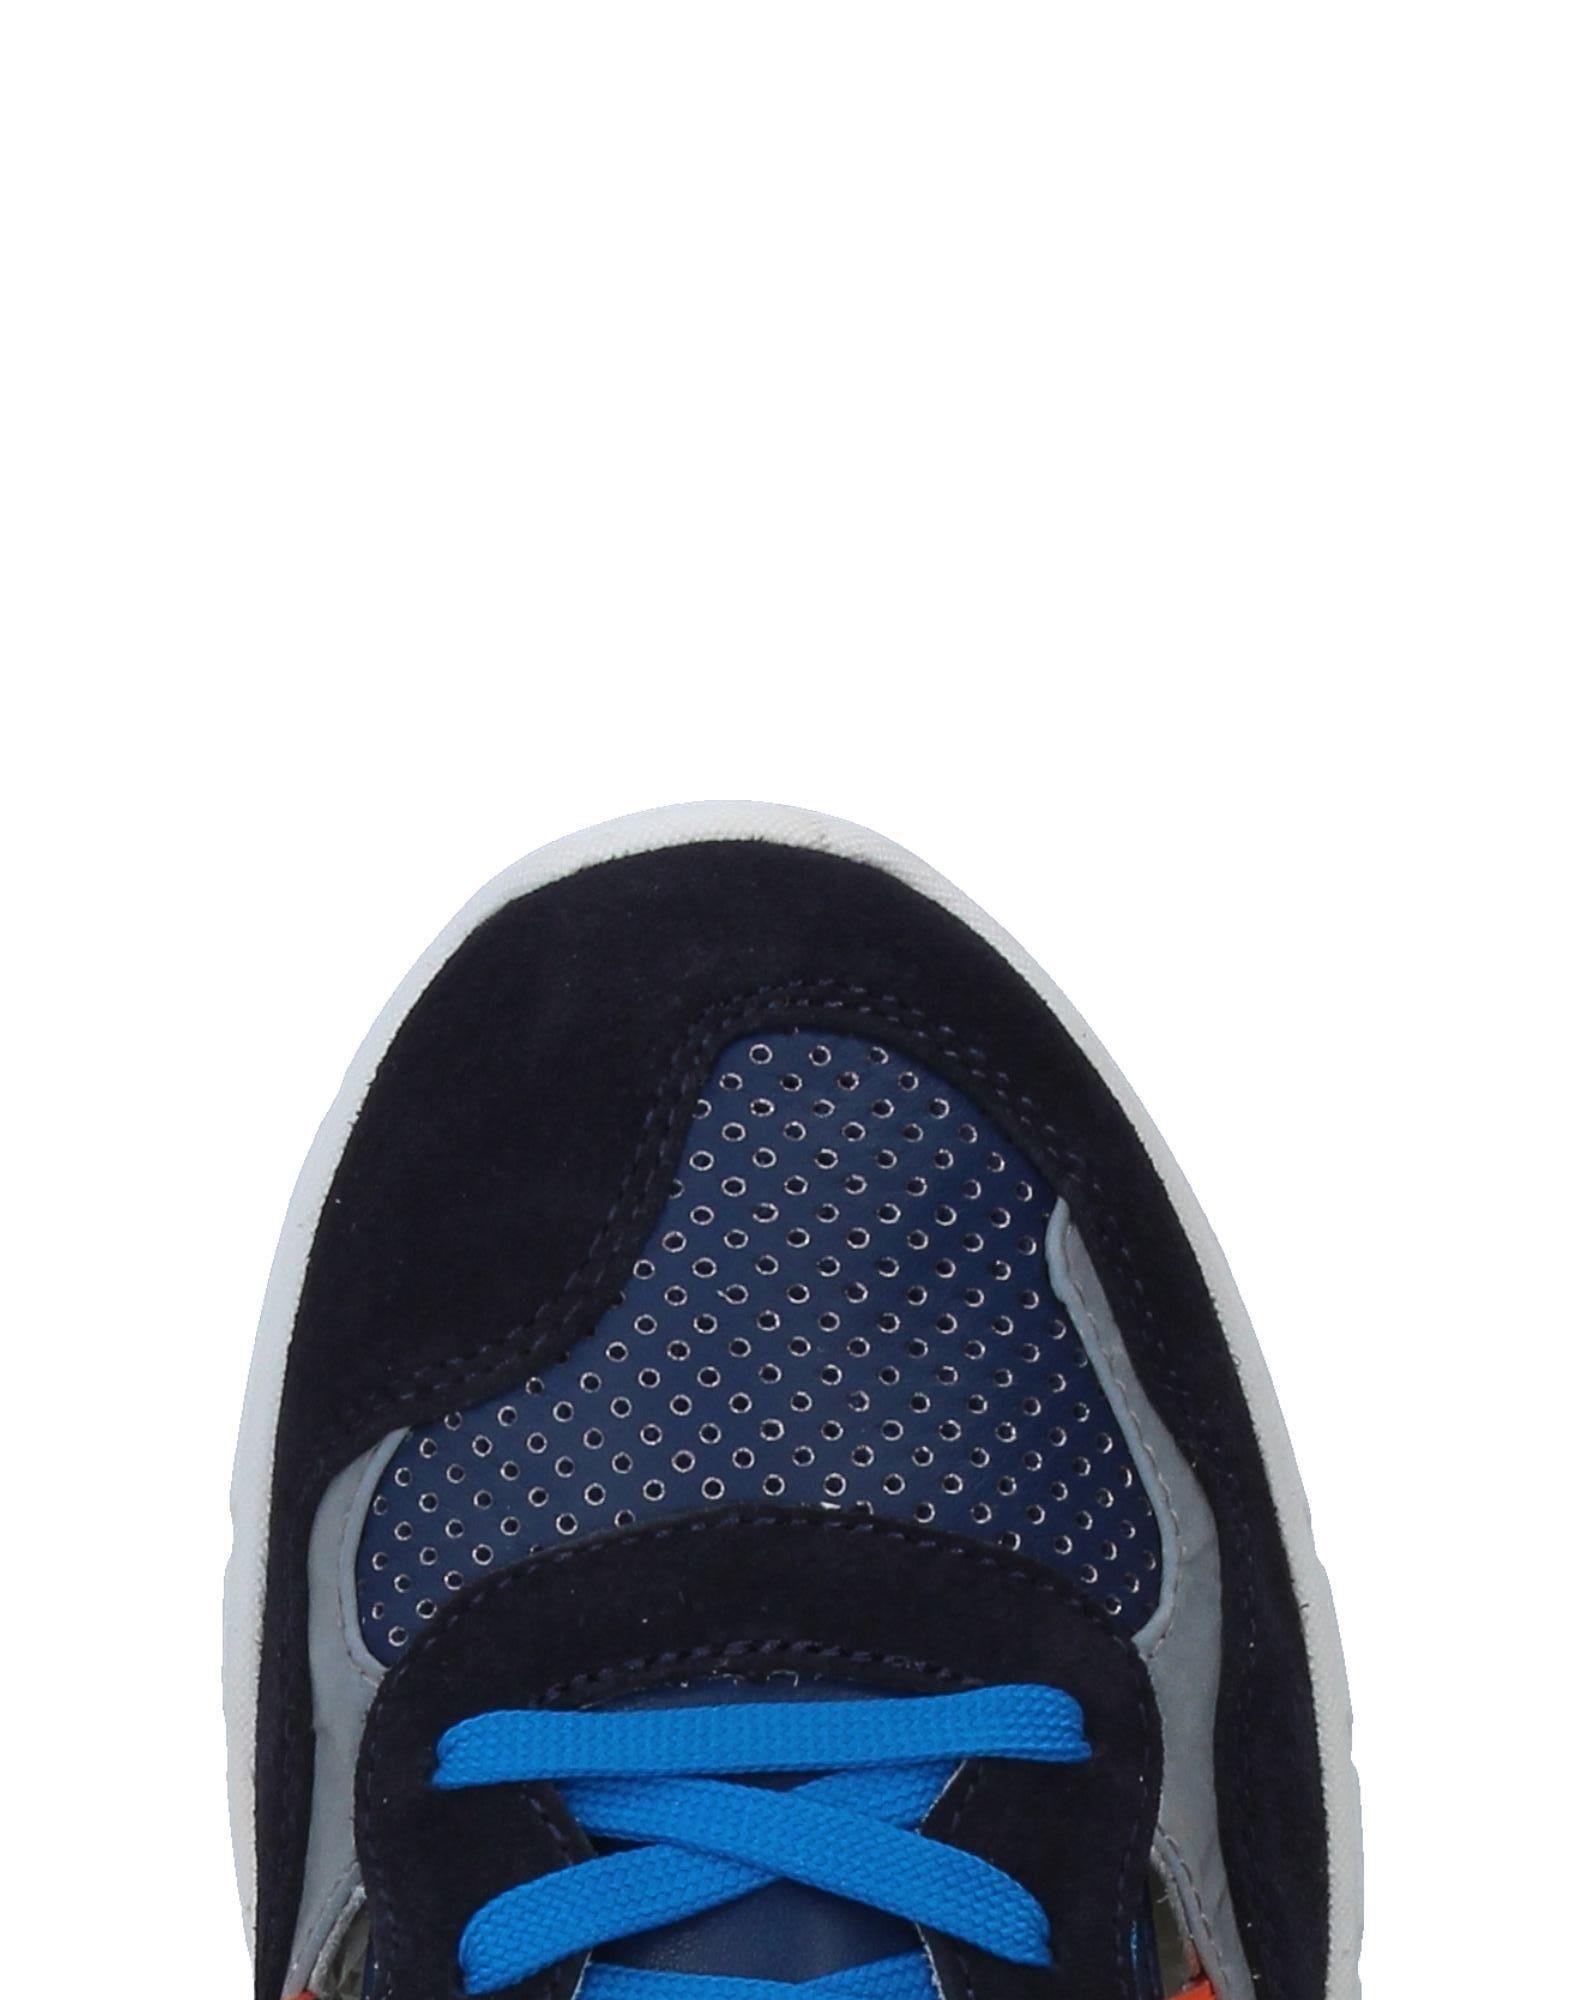 Dolce & Gabbana Sneakers Herren 11212938GR  11212938GR Herren 0ebf58